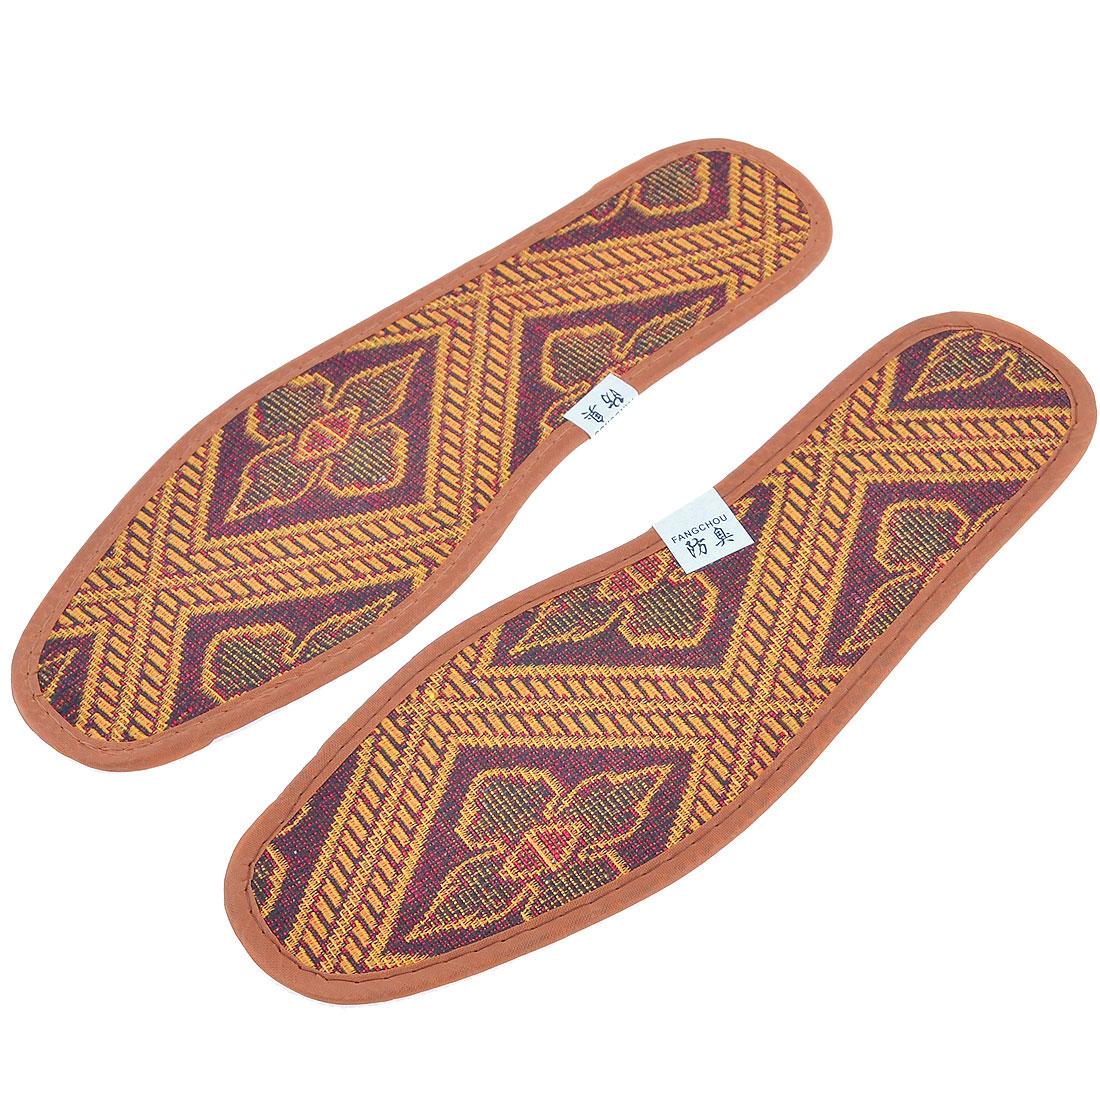 Man Floral Pattern Anti-slip Insoles Shoe Pads Pair Yellow Brown EU Size 42.5